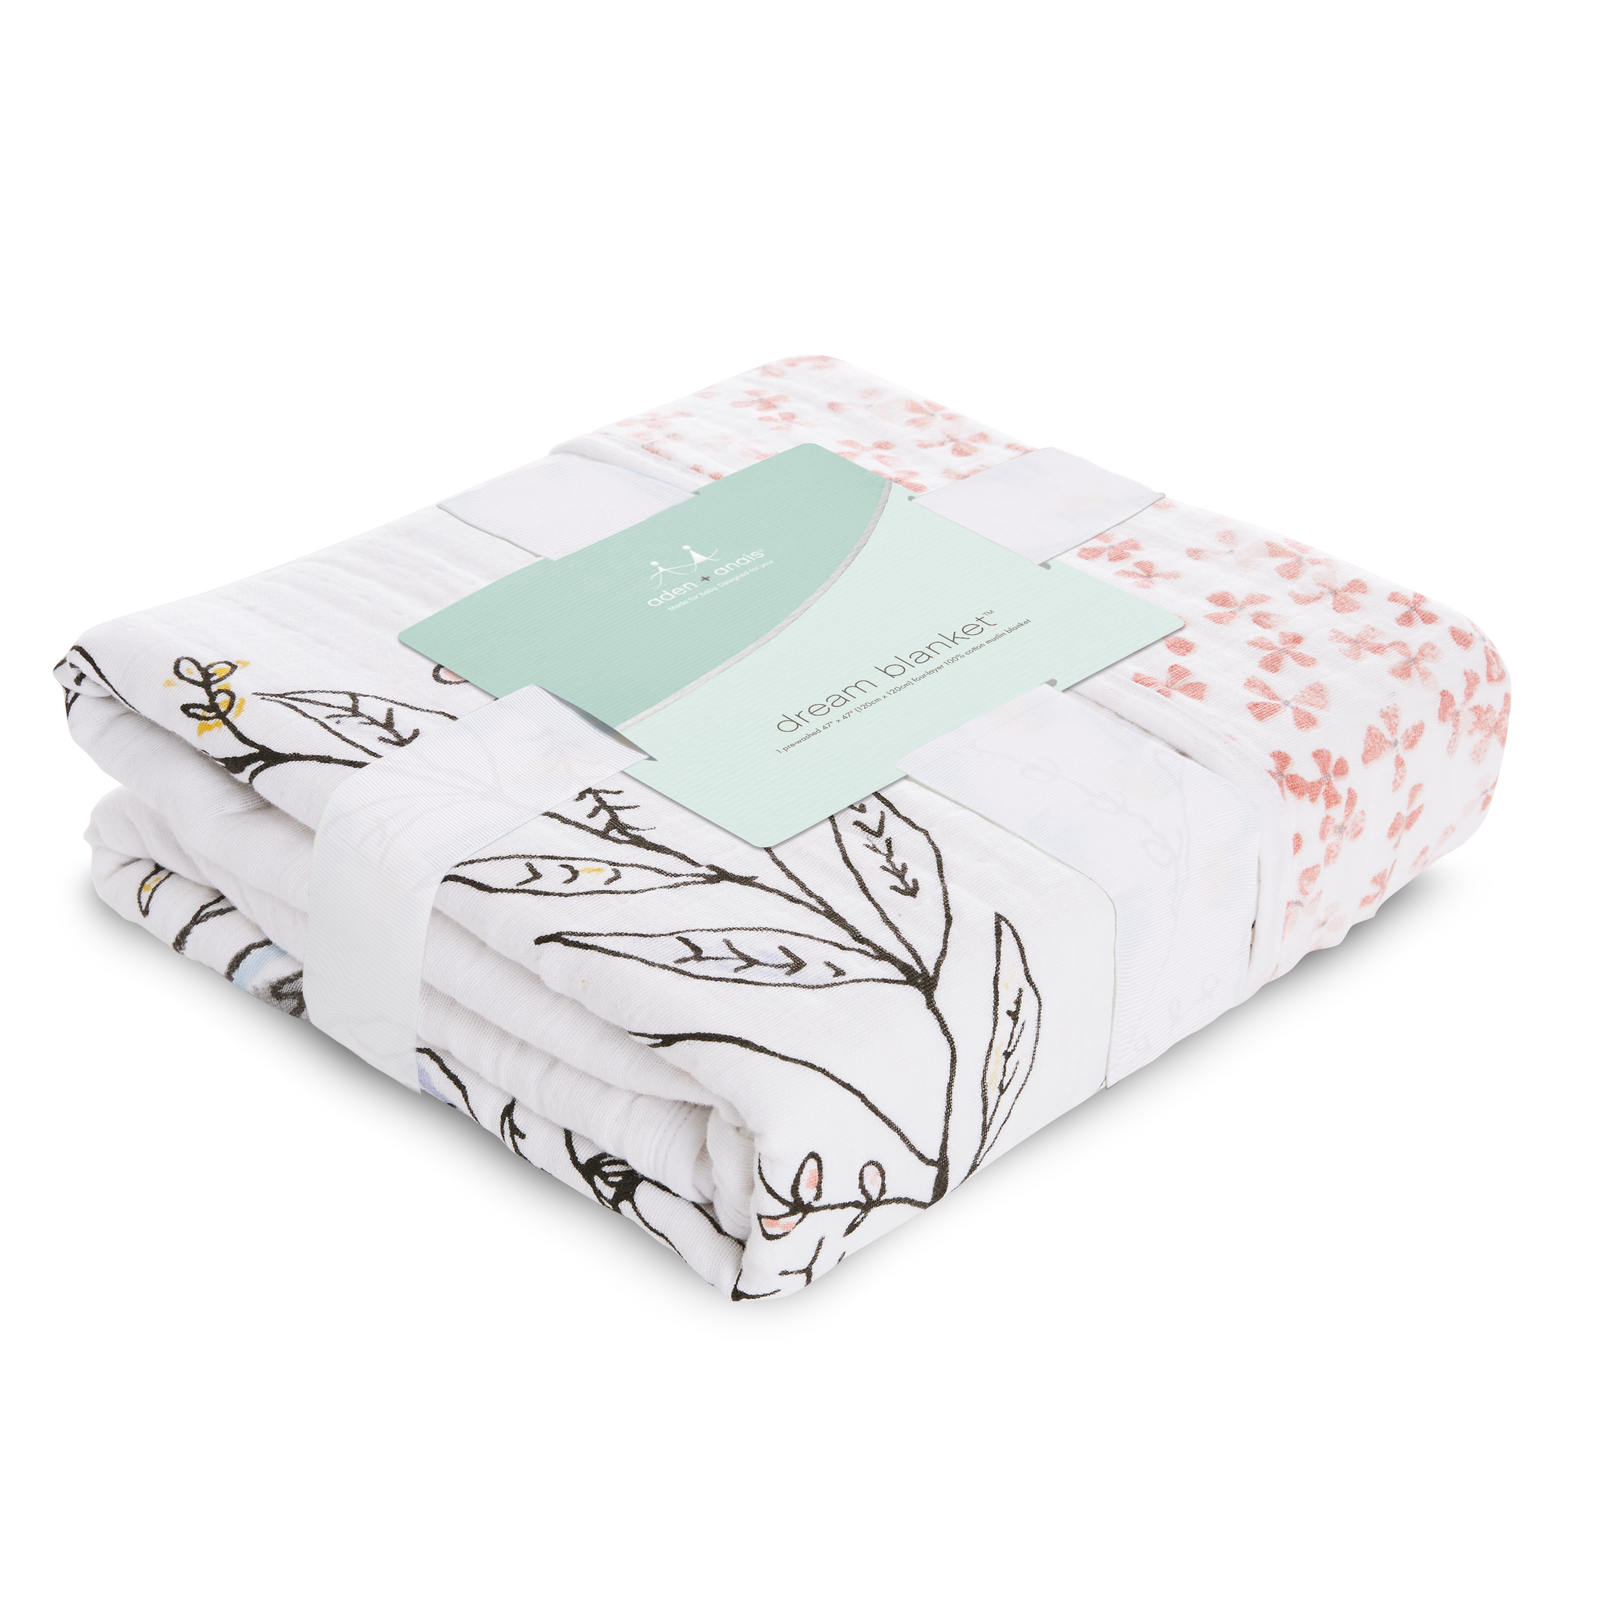 Aden + Anais: Classic Dream Blanket - Birdsong image